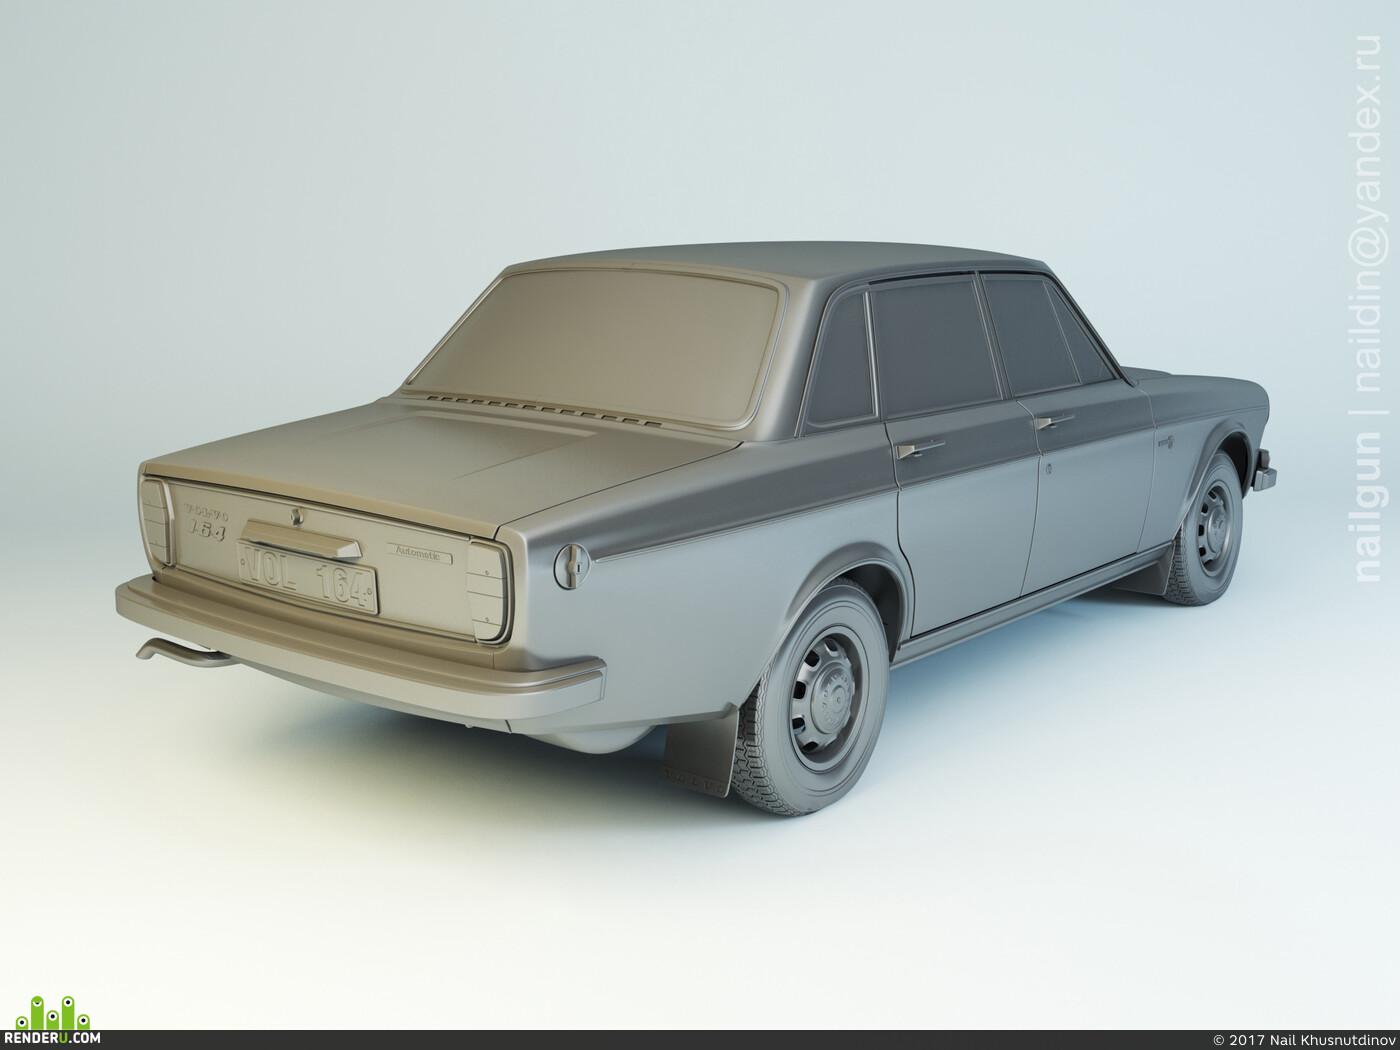 nailgun3d, nailgun, Car / motorcycle, volvo, volvo-164, car, vechicle, automotive